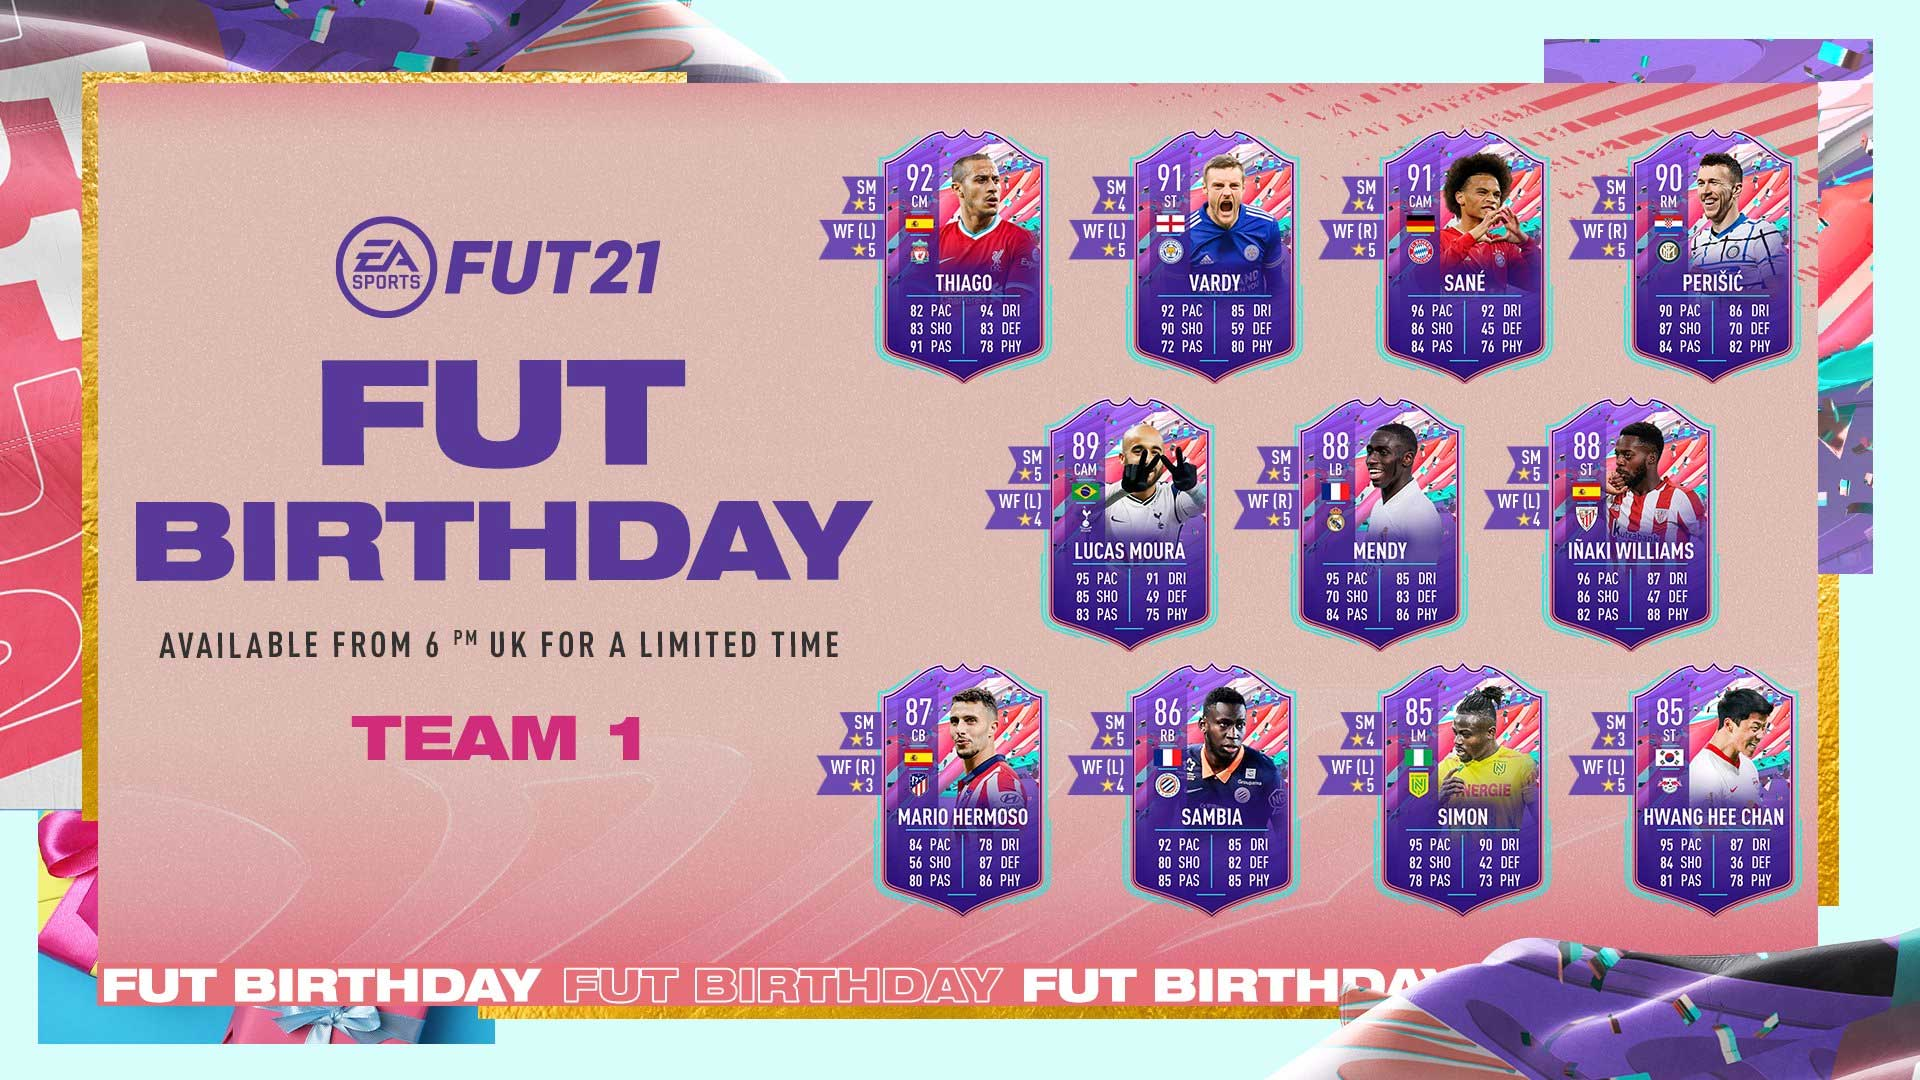 Aniversario de FUT - FIFA 21 Ultimate Team